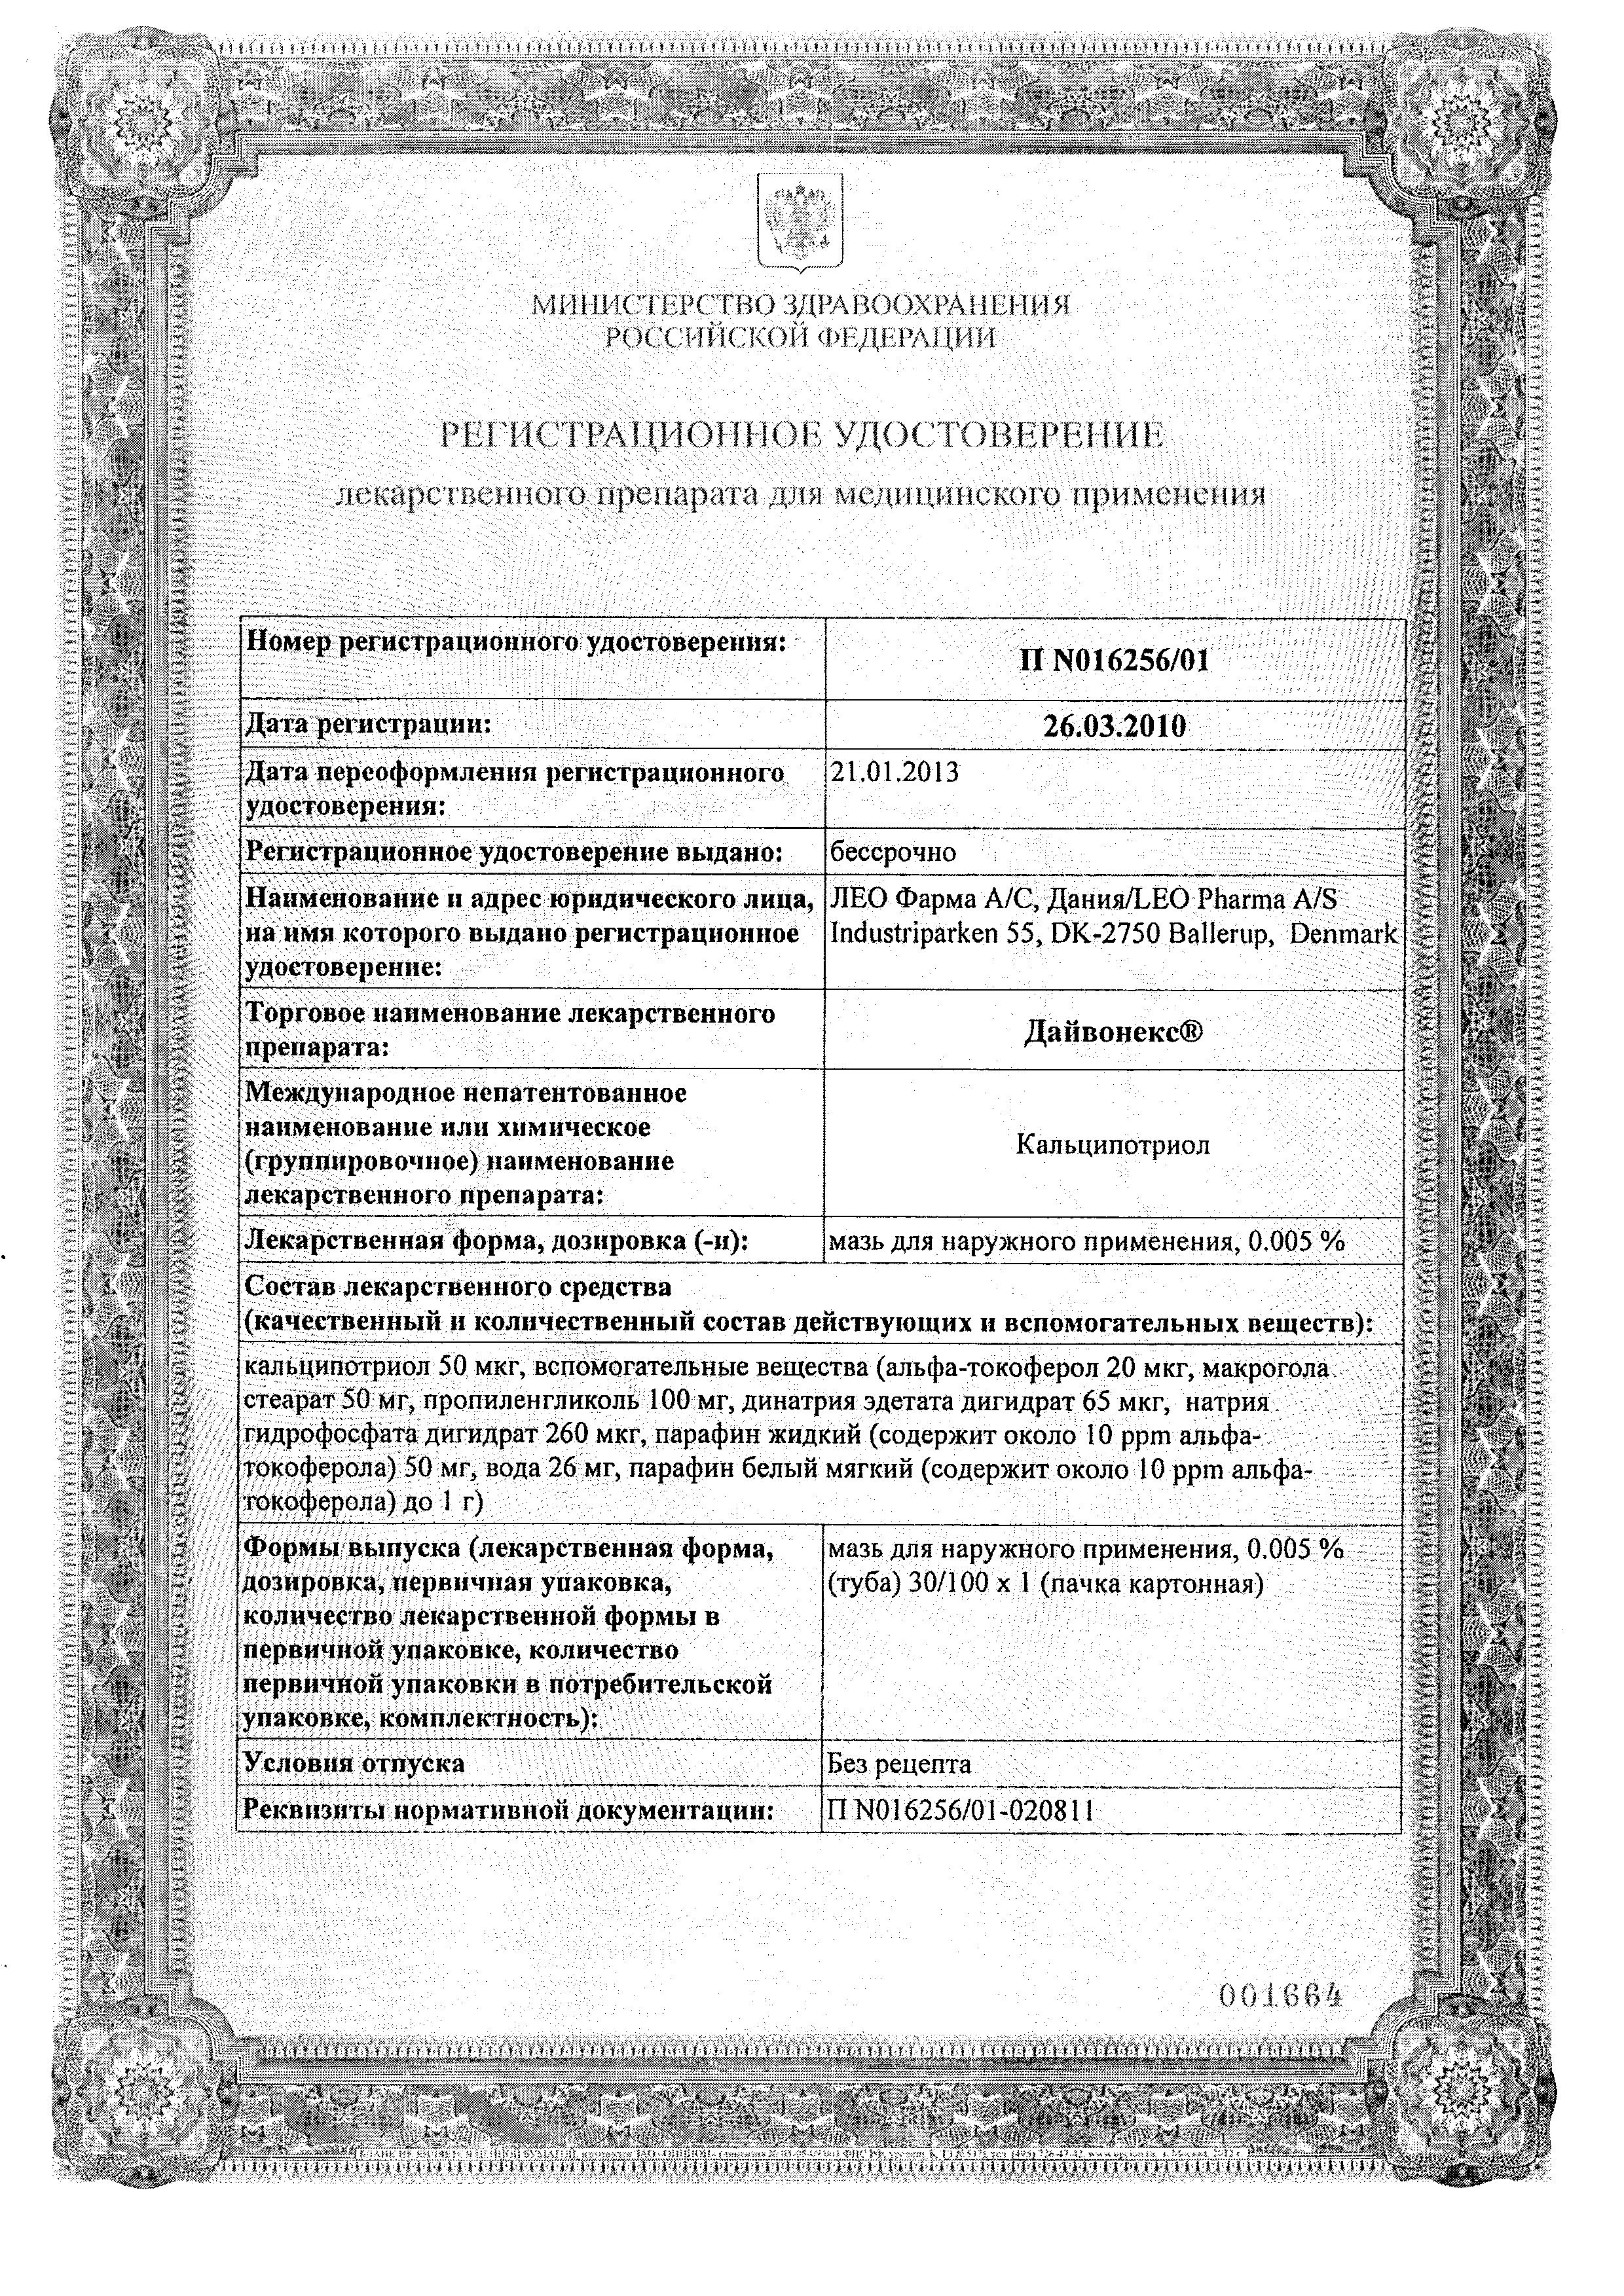 Дайвонекс сертификат